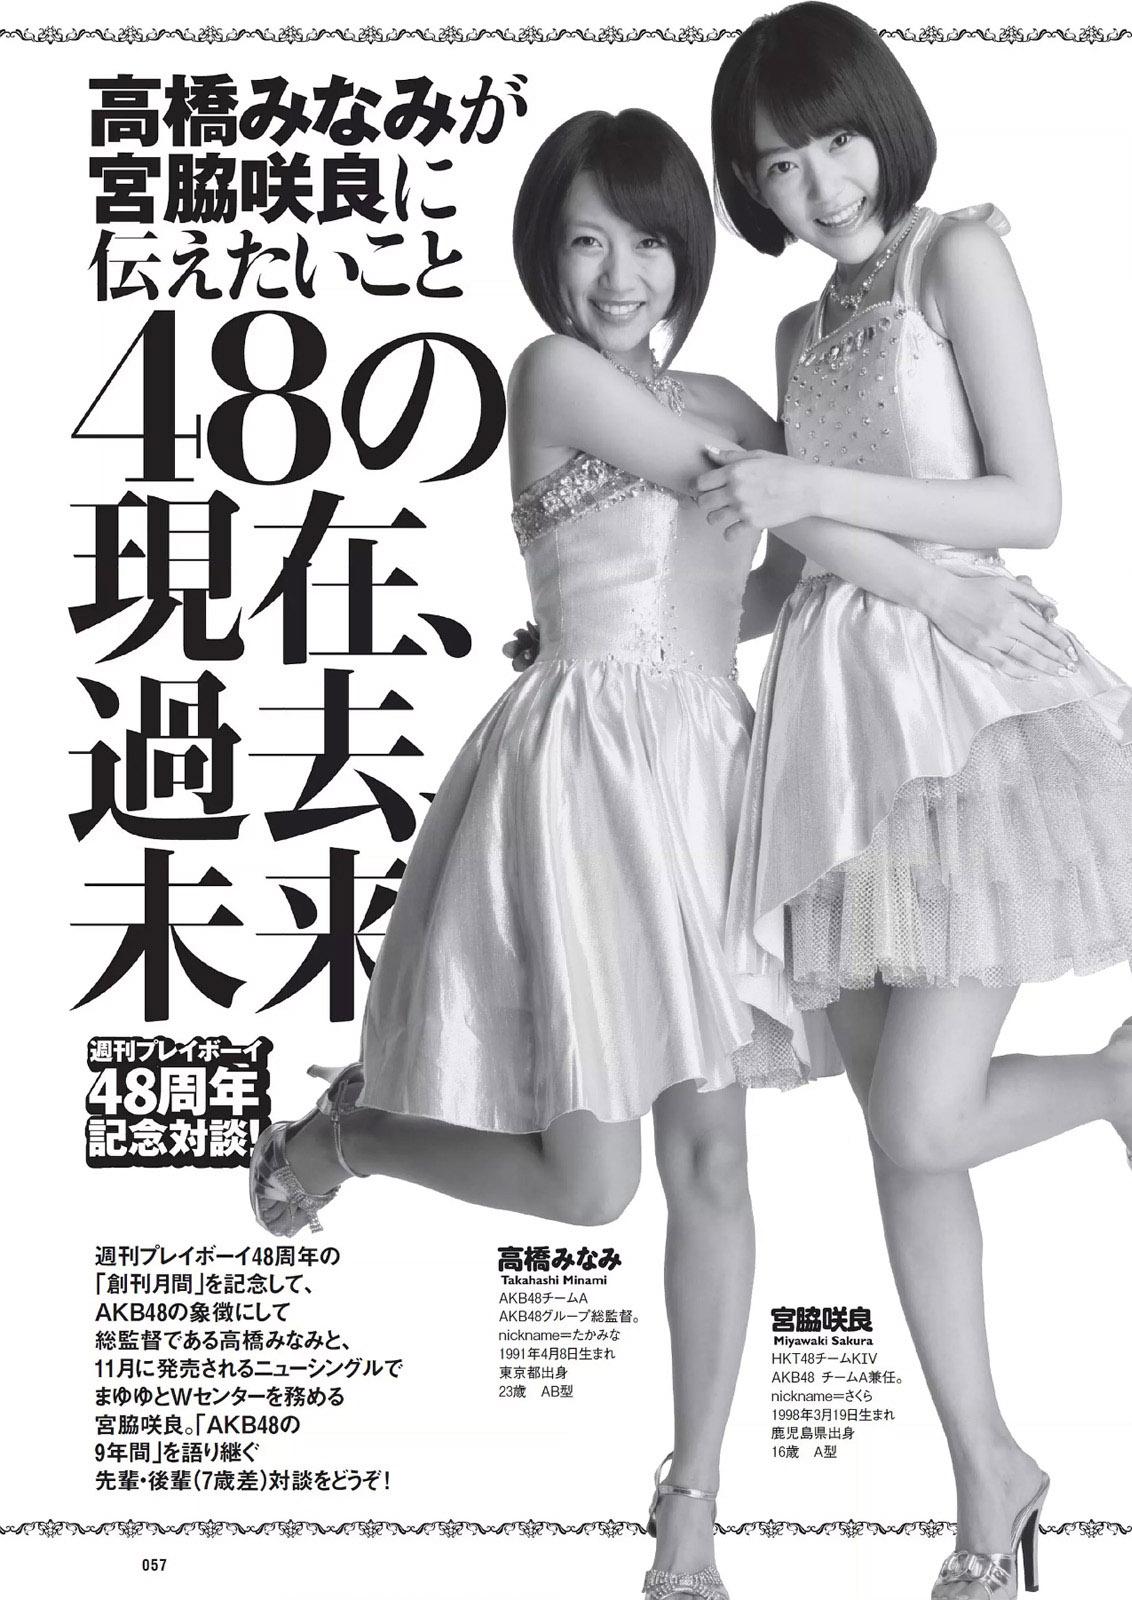 AKB48 WPB 141020 06.jpg